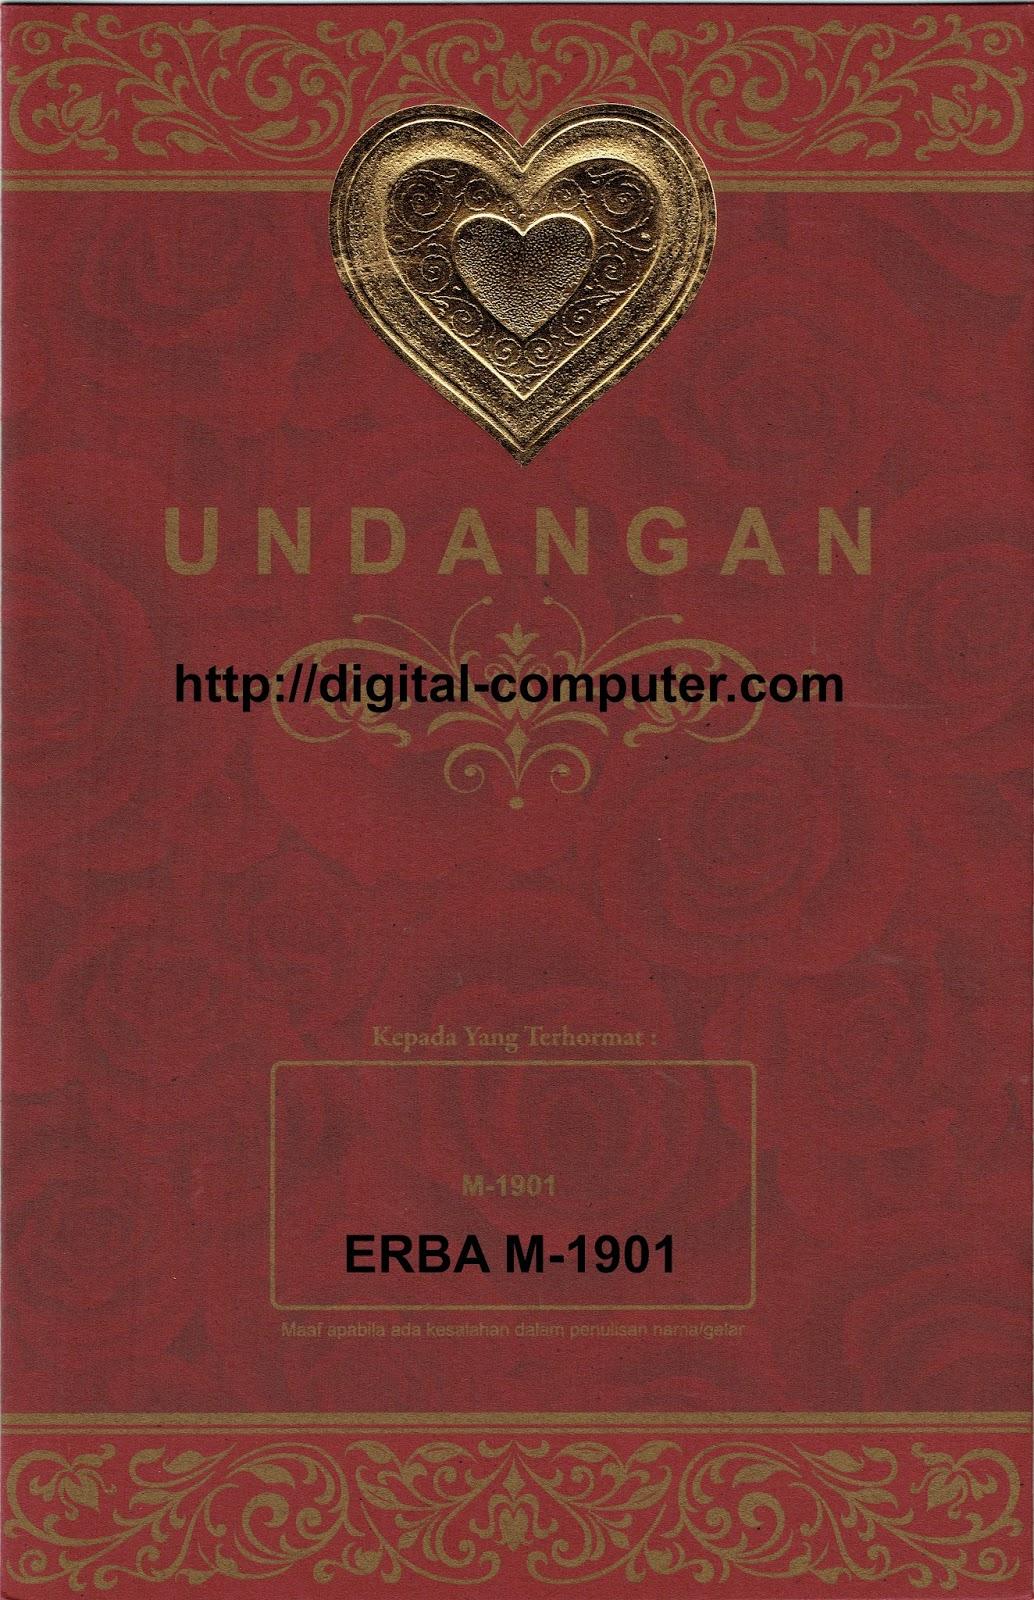 Undangan Softcover ERBA M-1901